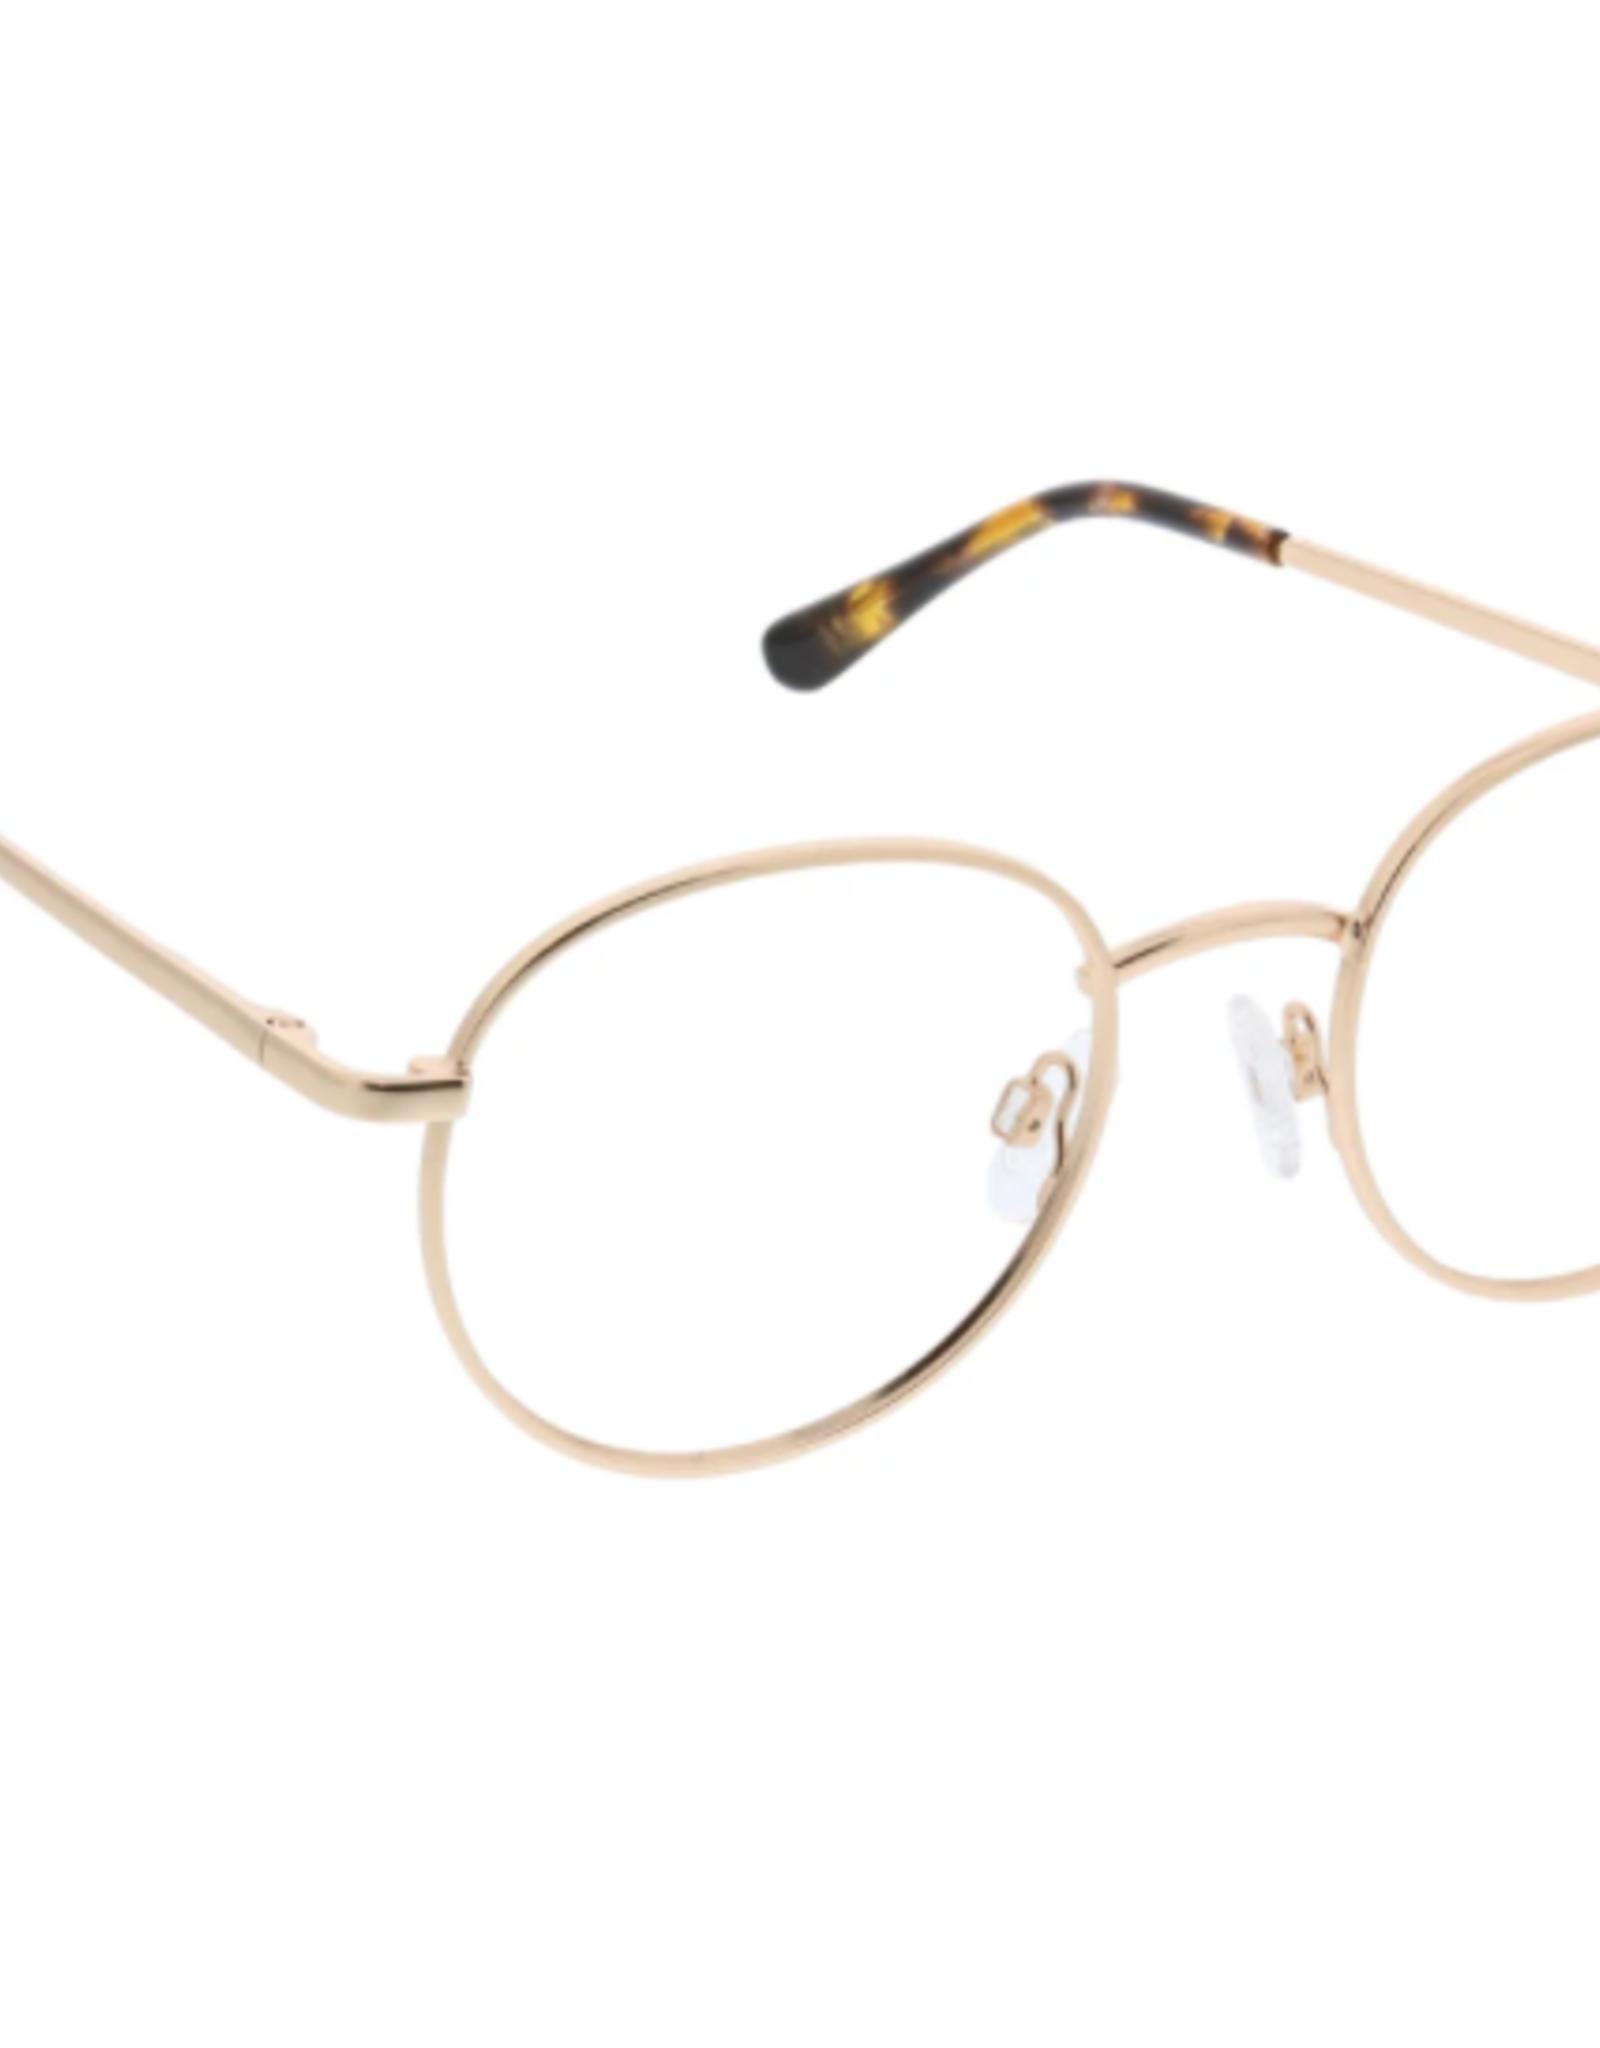 The Good Life Blue Light Glasses